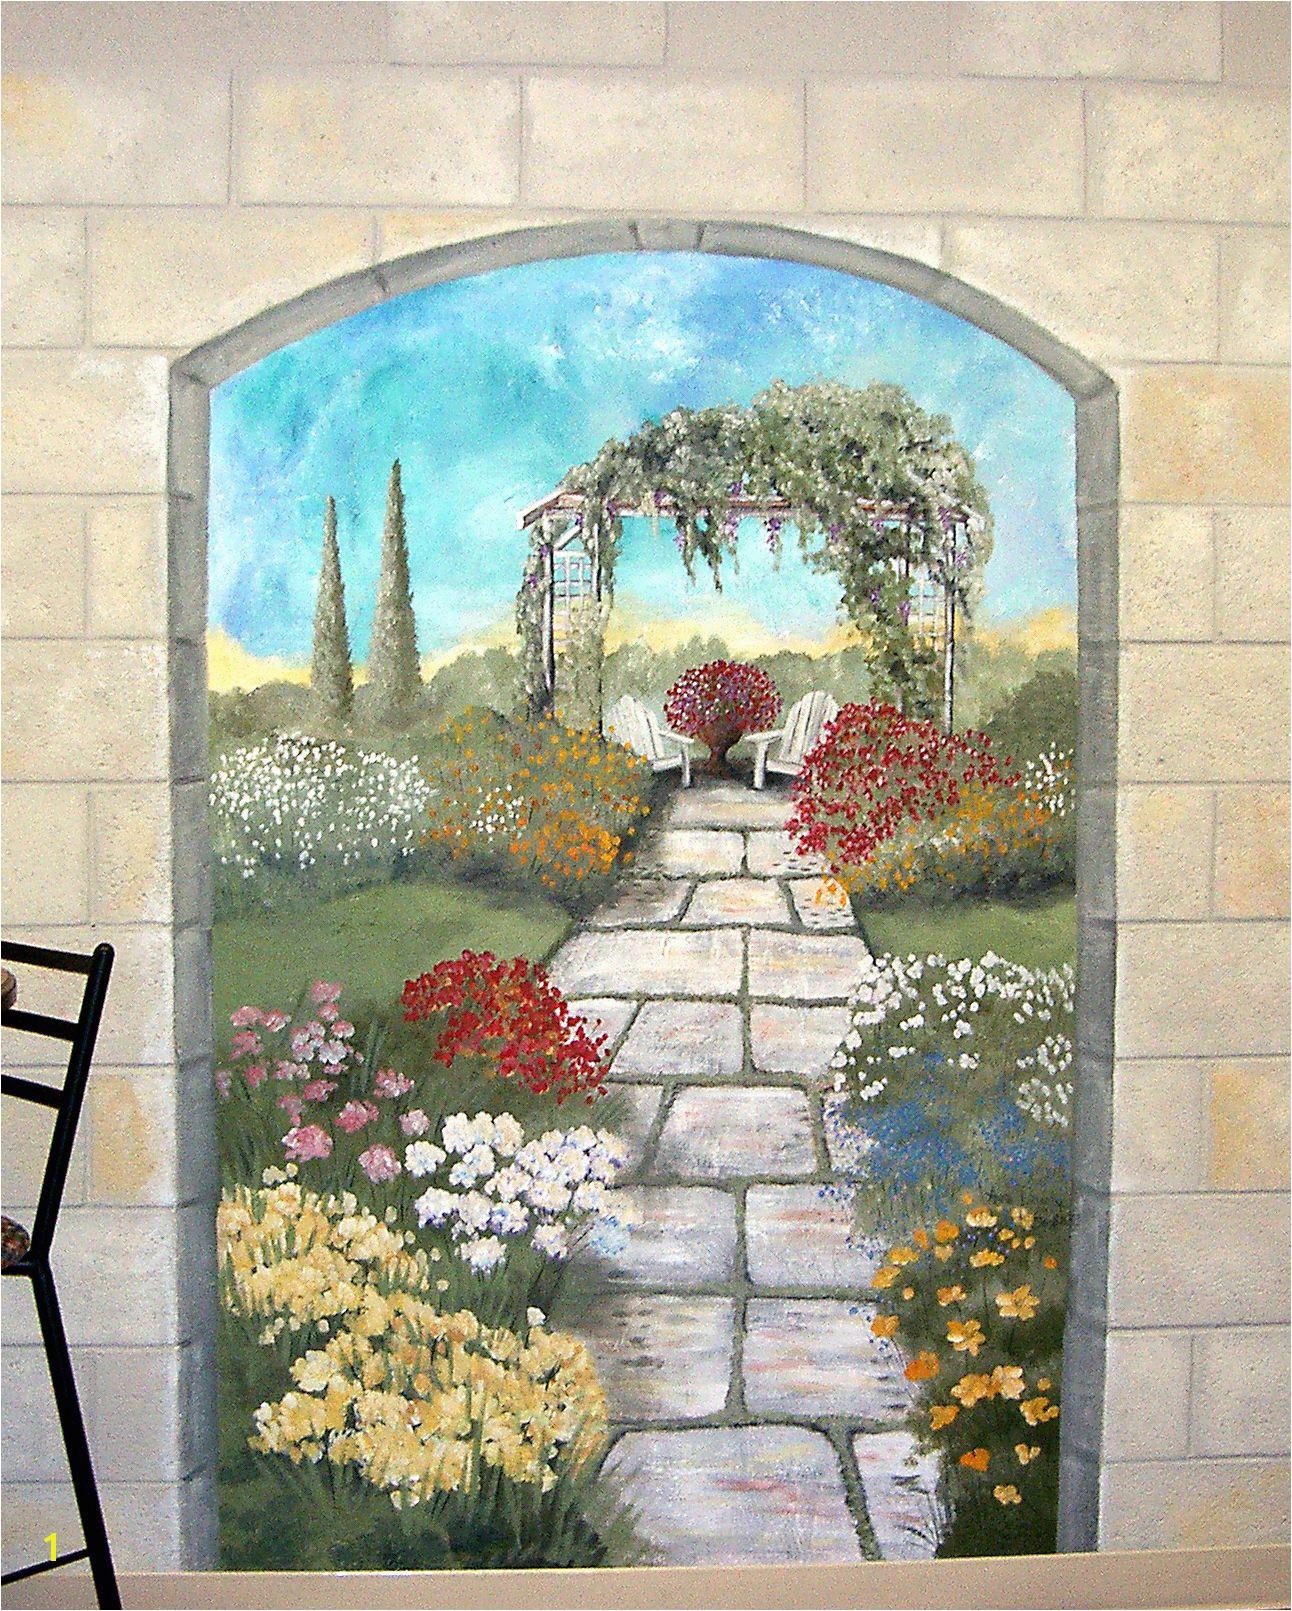 Garden mural on a cement block wall Colorful flower garden mural with terrace